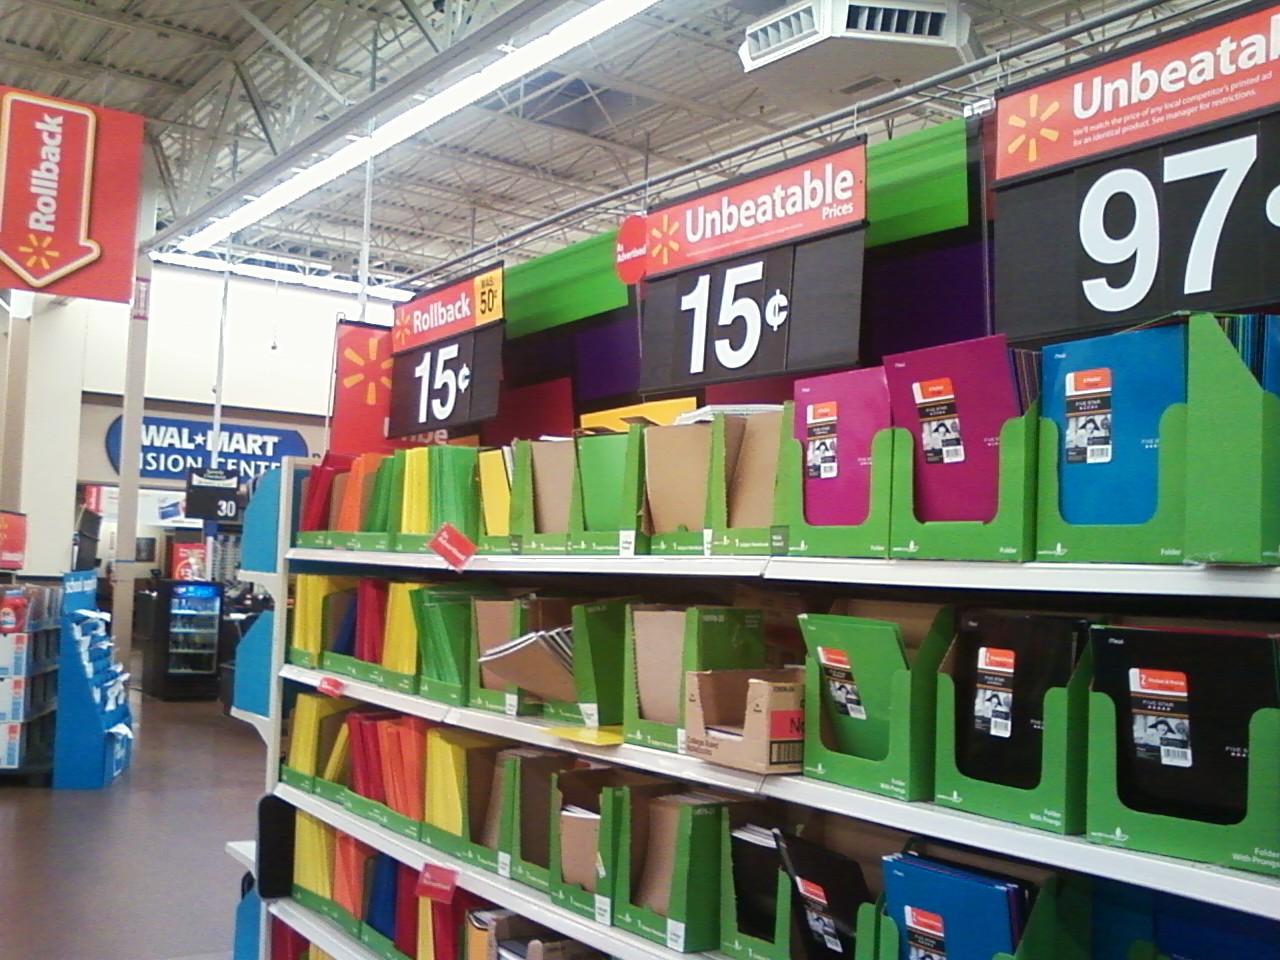 Photo: notebooks at Walmart